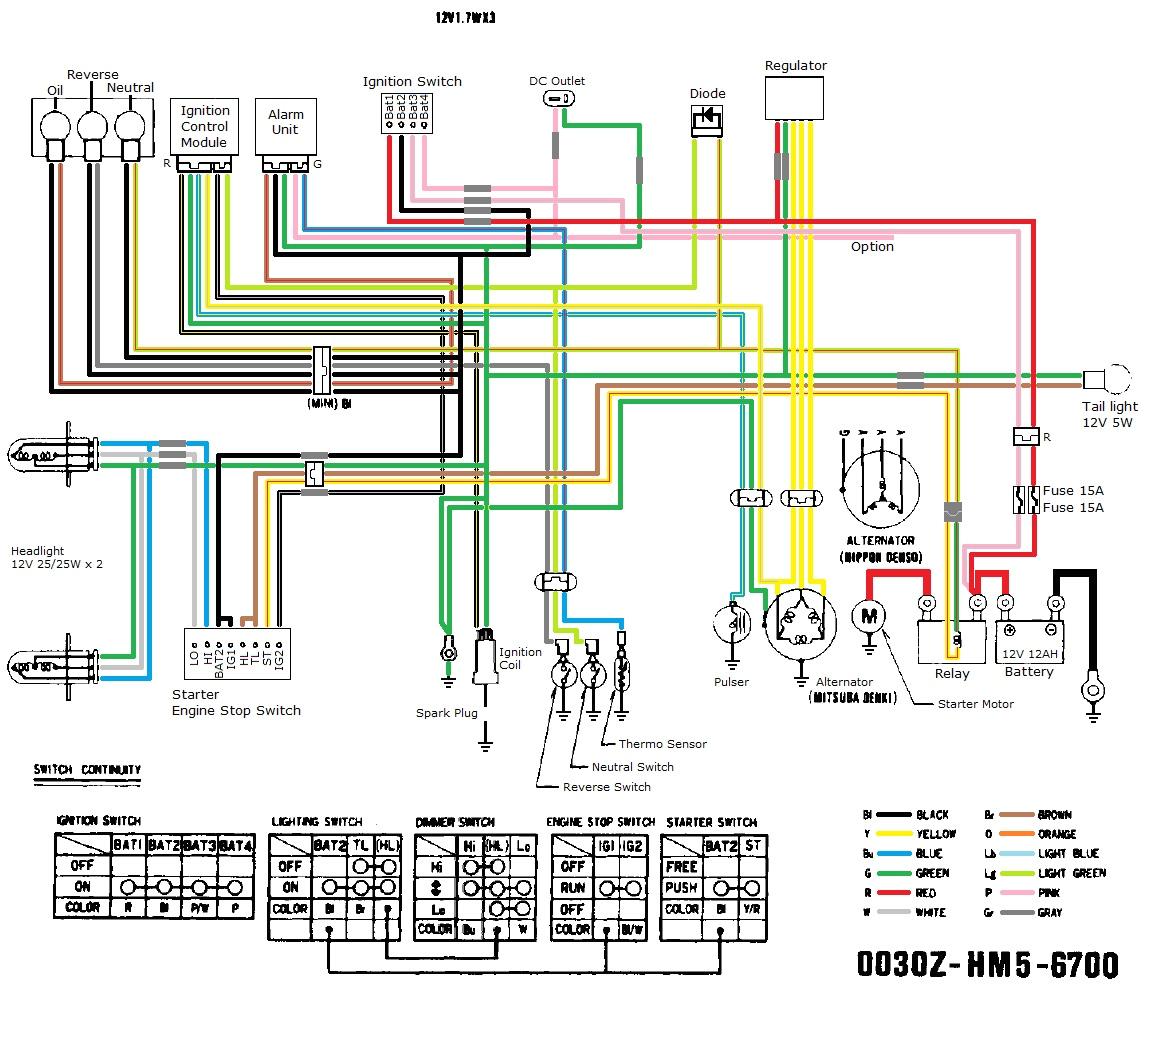 wildfire quad wiring diagram wiring diagram article review wildfire 250cc wiring diagram wiring diagram perfomancewildfire atv